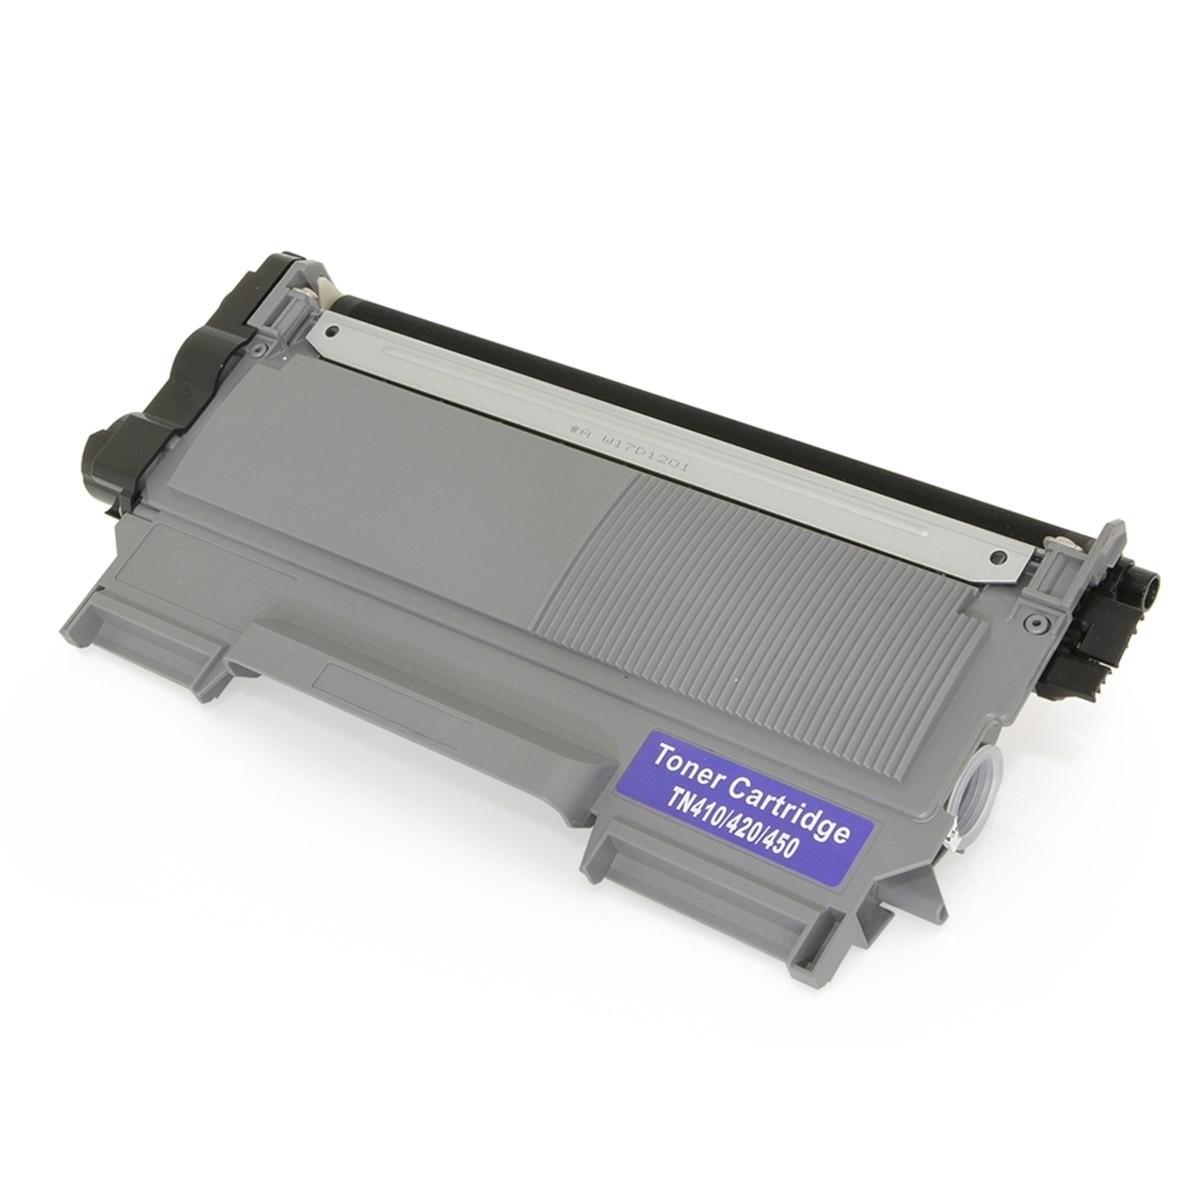 Toner Compatível Brother TN410|TN420|TN450 para Brother MFC7360N DCP7065DN MFC7860DW HL2240 HL2270DW HL2130 | 2.6k